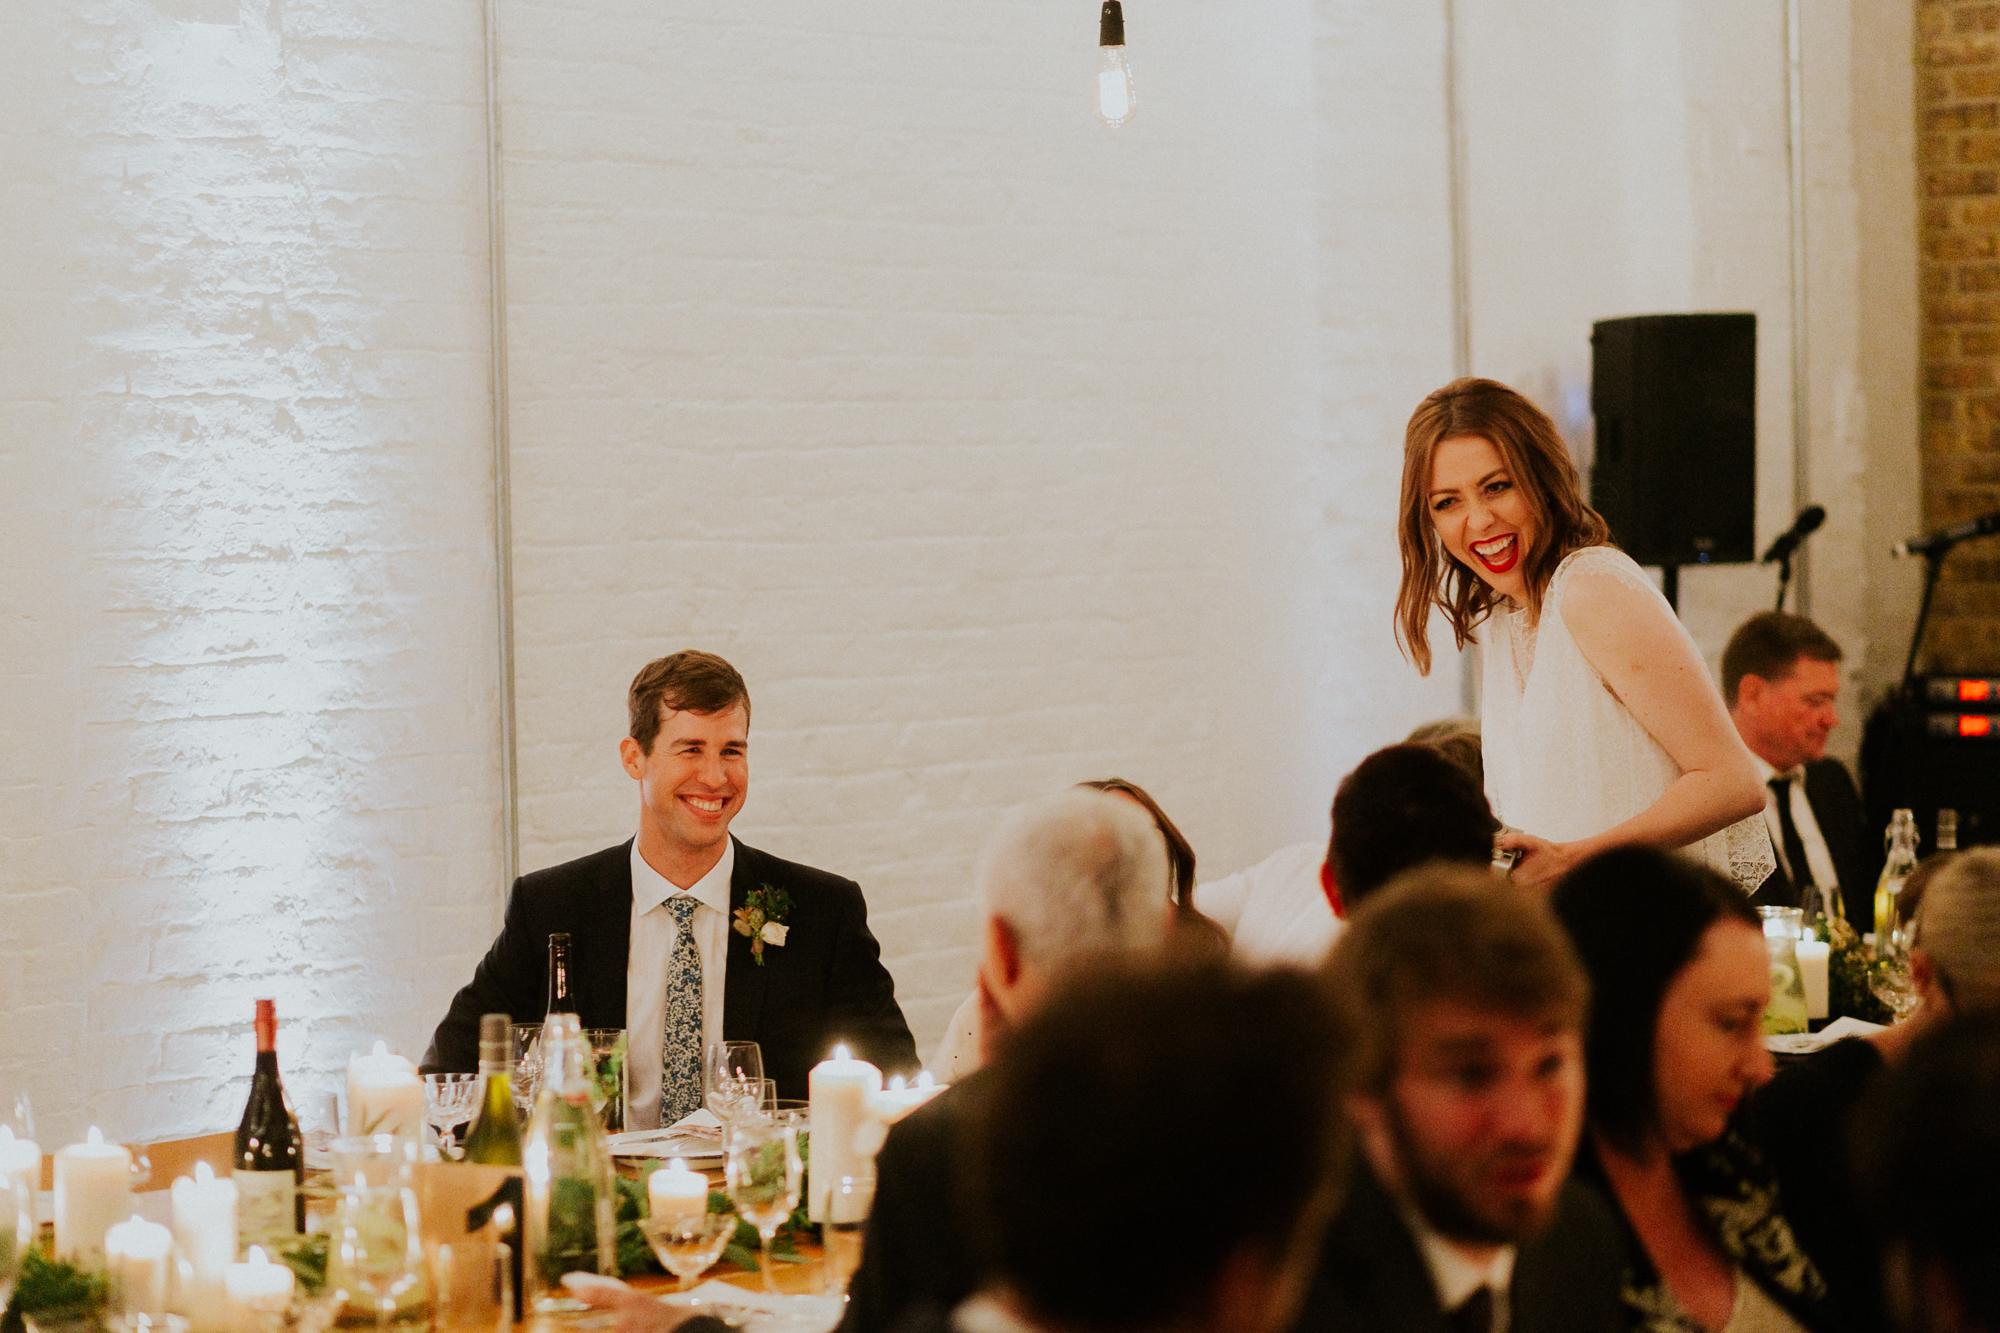 Quirky Venue, Non-traditional wedding planner, dry-hirevenue, London Wedding coordination, Event Bar, Bespoke weddings, Event team, Brixton East 1871 Wedding, Streetfood wedding, informal, Stylish